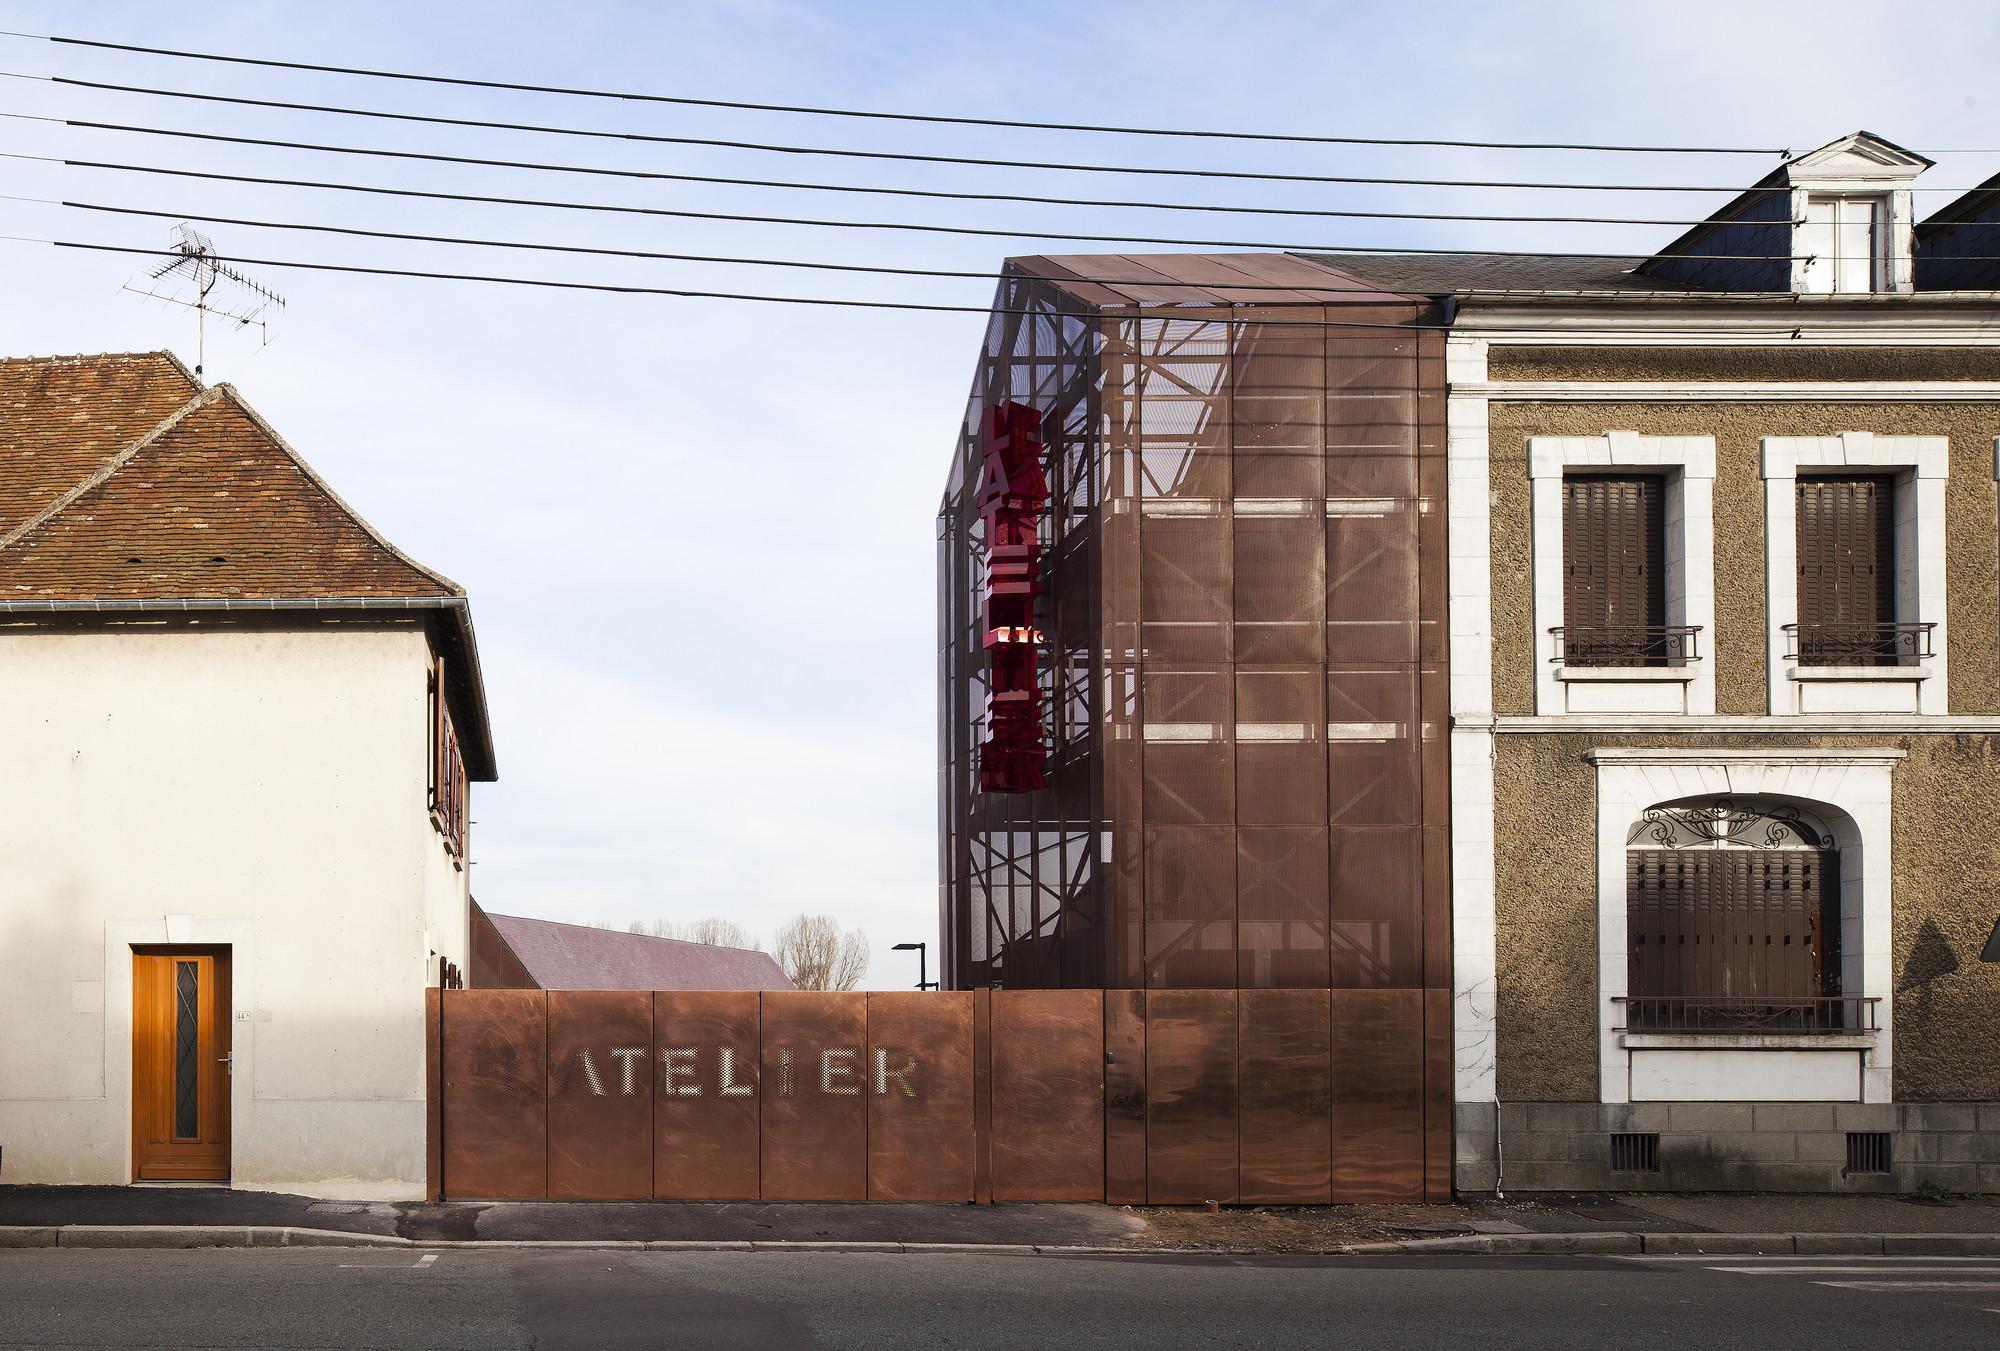 L'Atelier / AAVP Architecture, © Luc Boegly